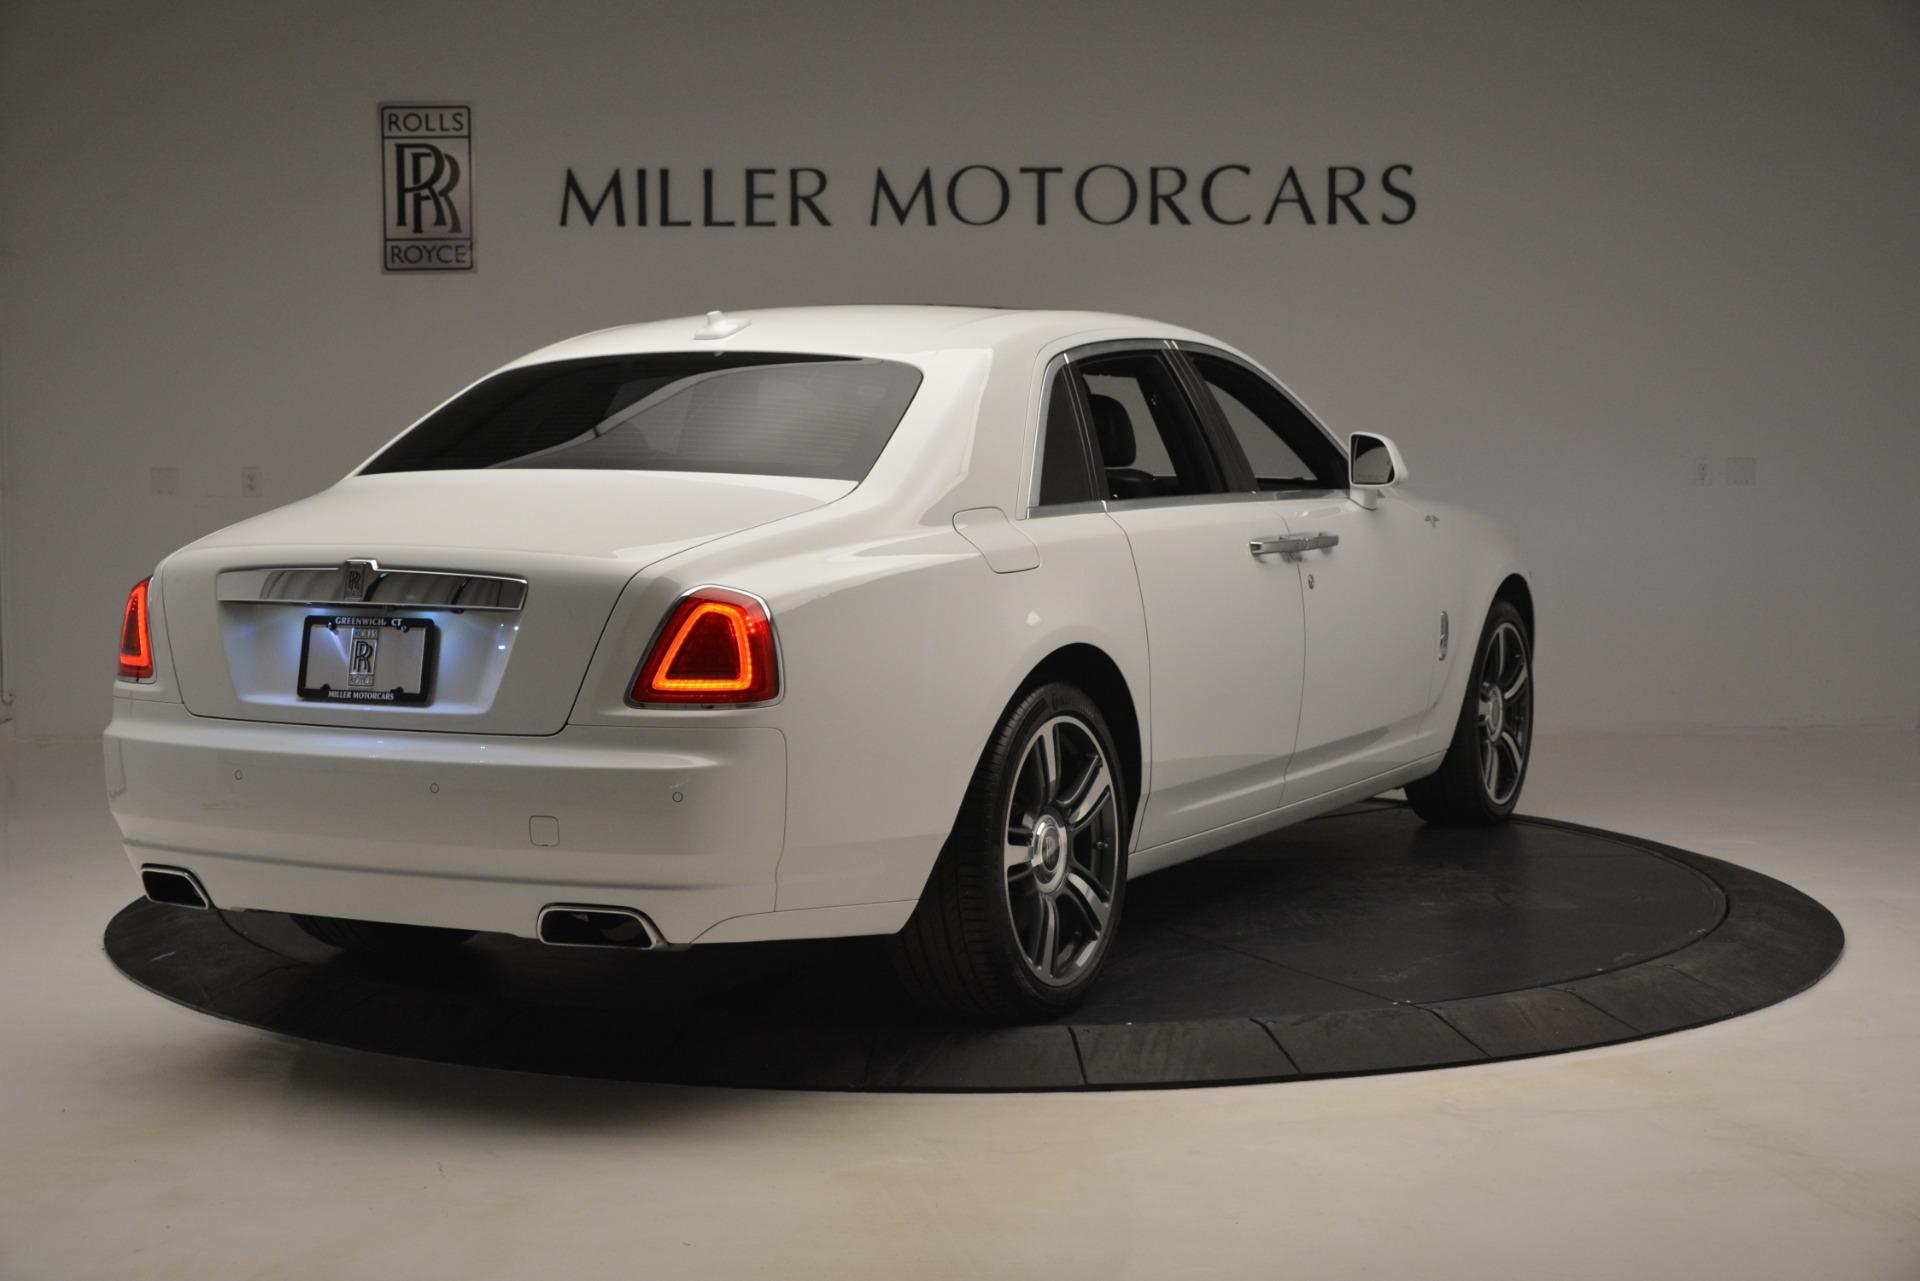 Used 2014 Rolls-Royce Ghost V-Spec For Sale In Westport, CT 2989_p8